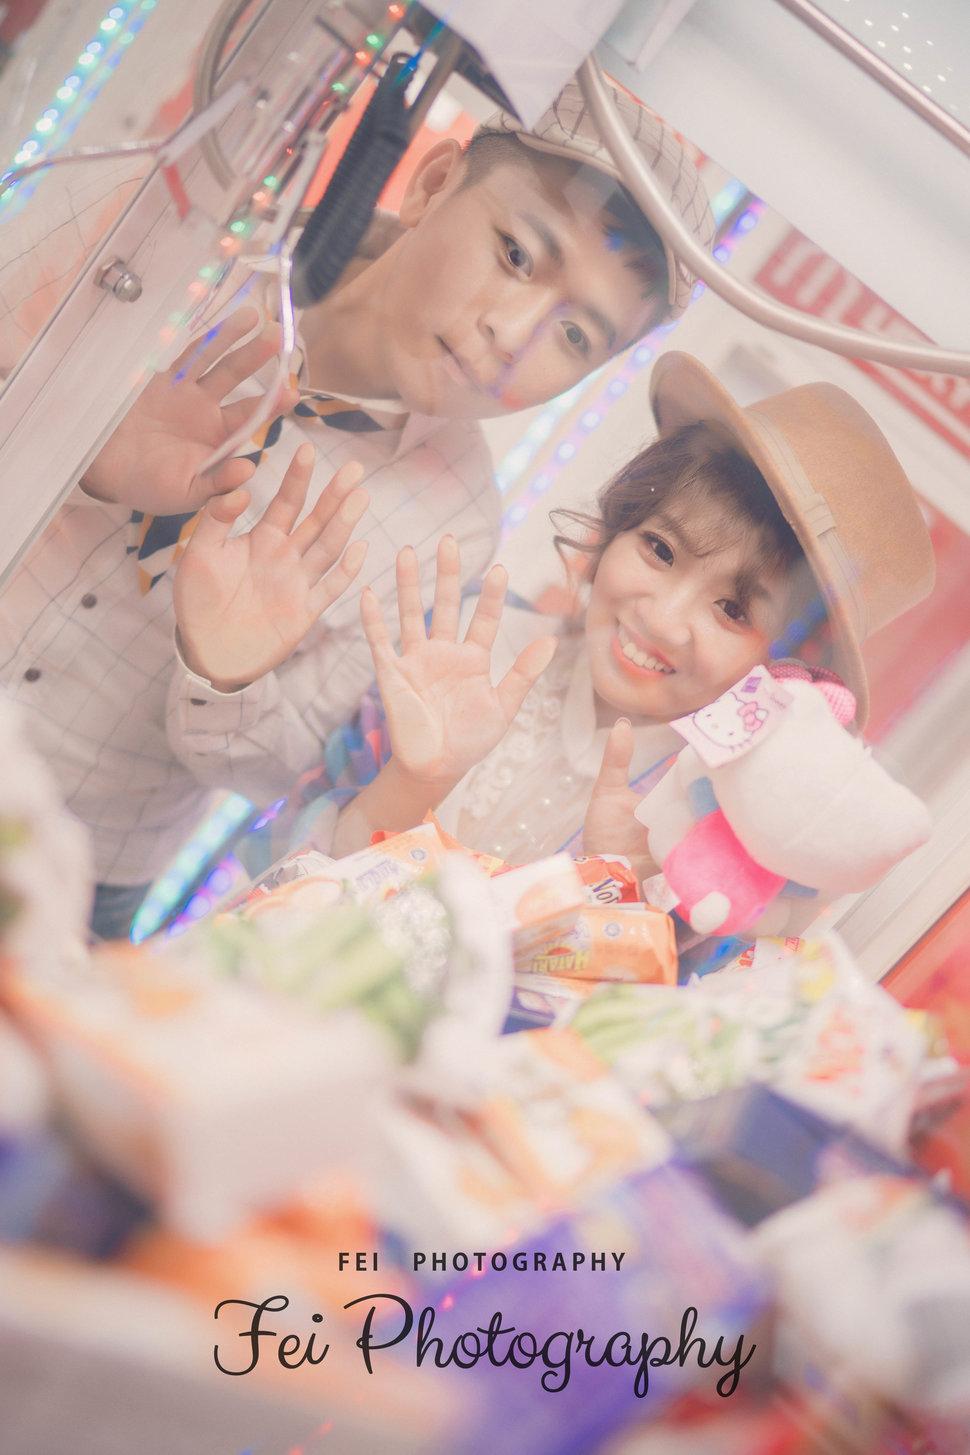 41 - 飛妃 Photography/女攝影師《結婚吧》